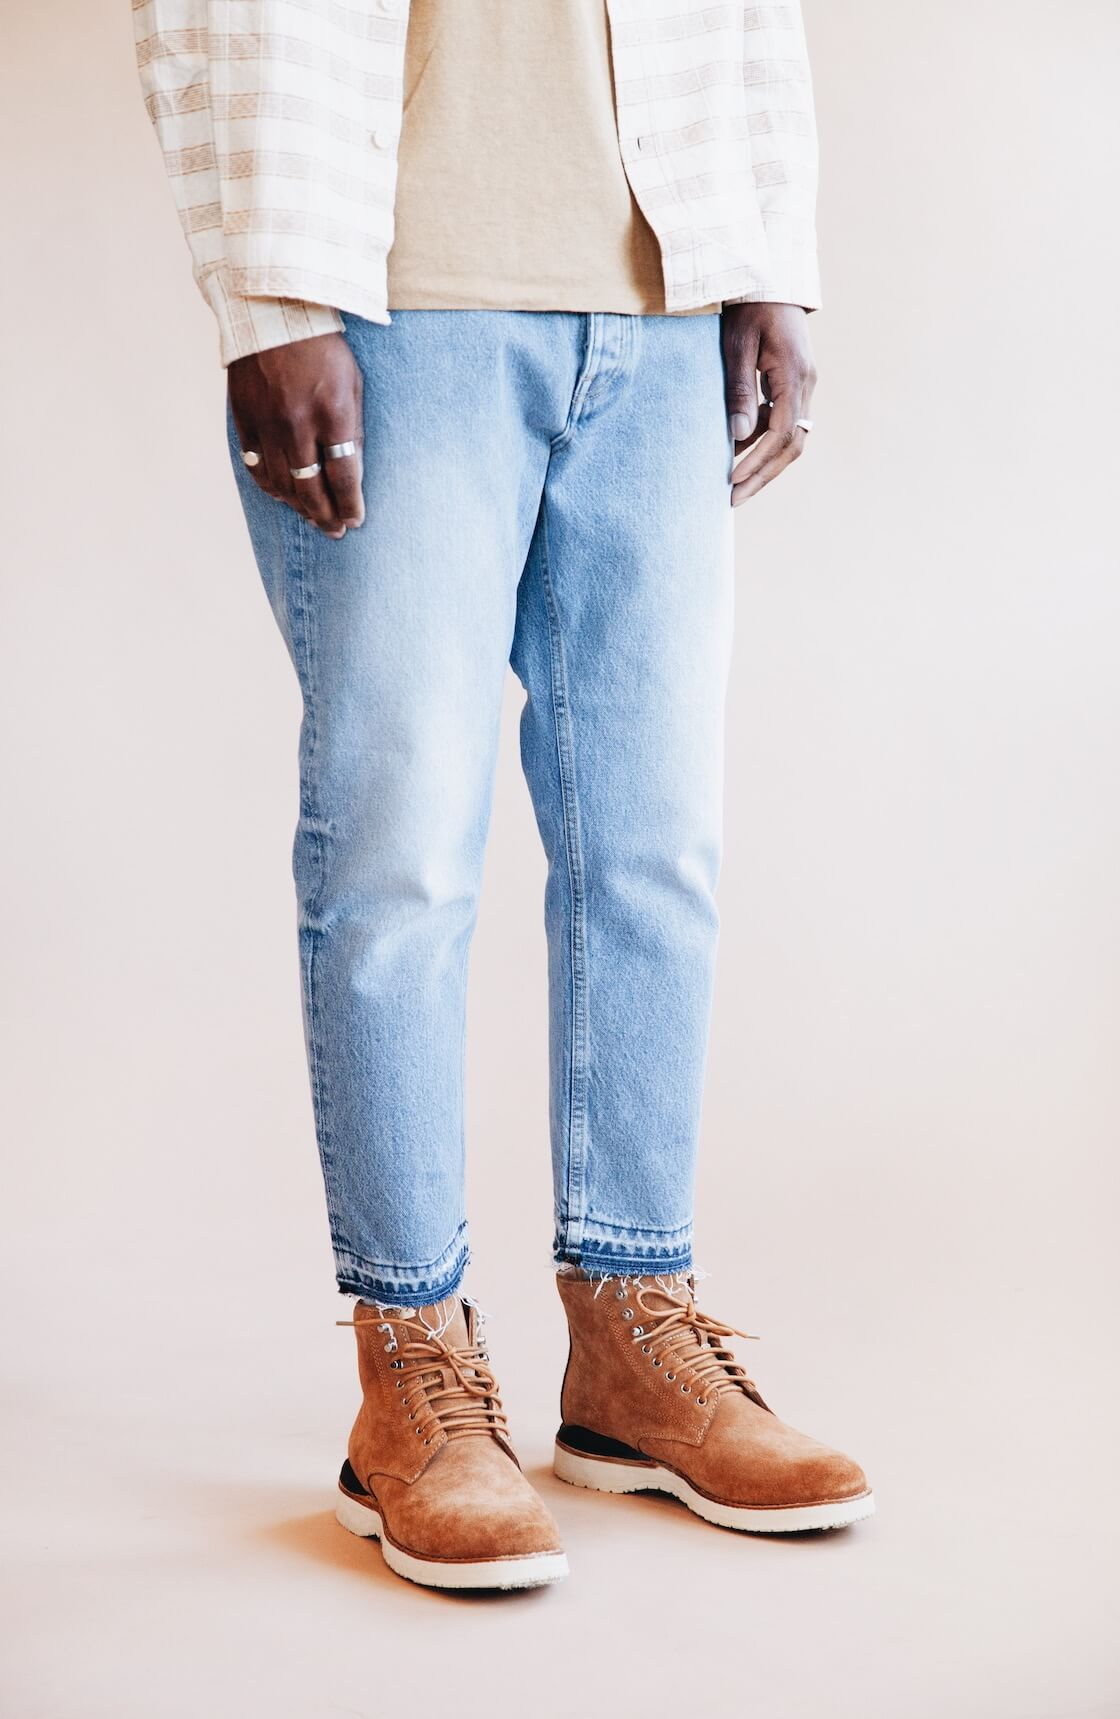 corridor nyc natural jacquard shirt, jungmaven baja pocket tee, harmony paris dorian jean and visvim virgil boots folk on body